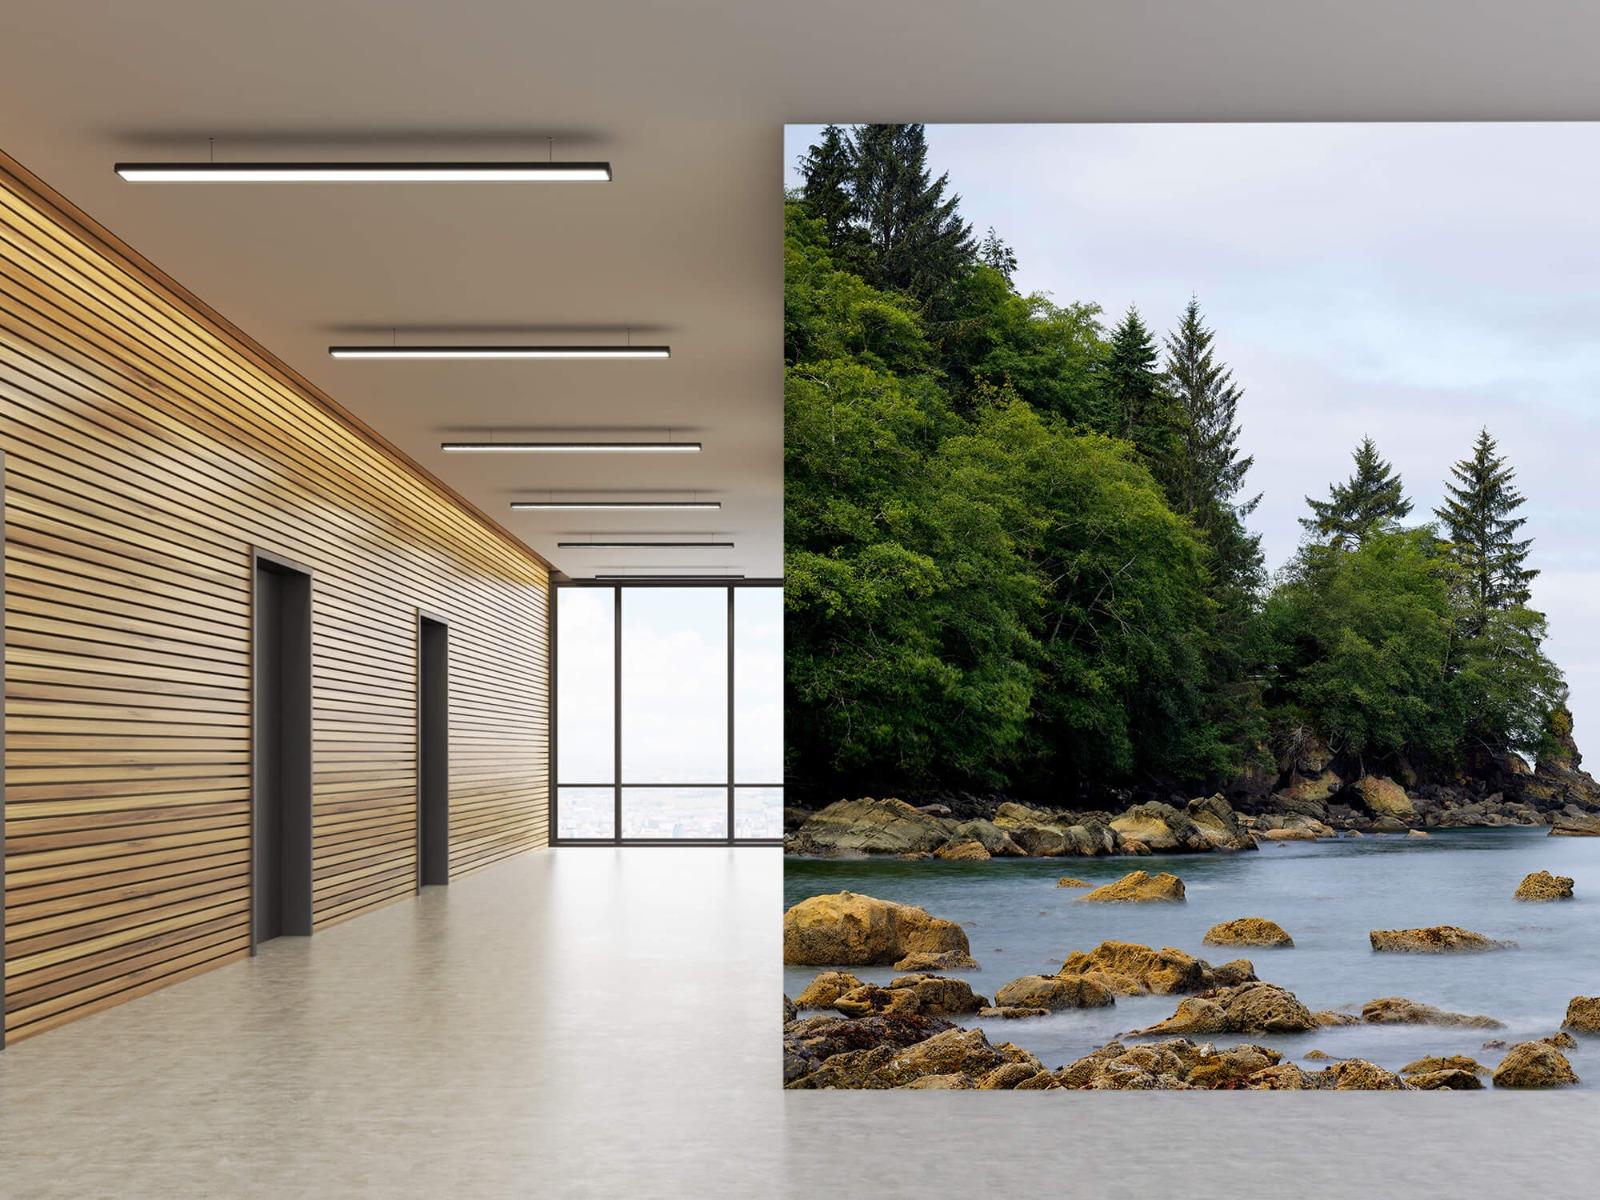 Bomen - Ruwe kustlijn - Slaapkamer 6